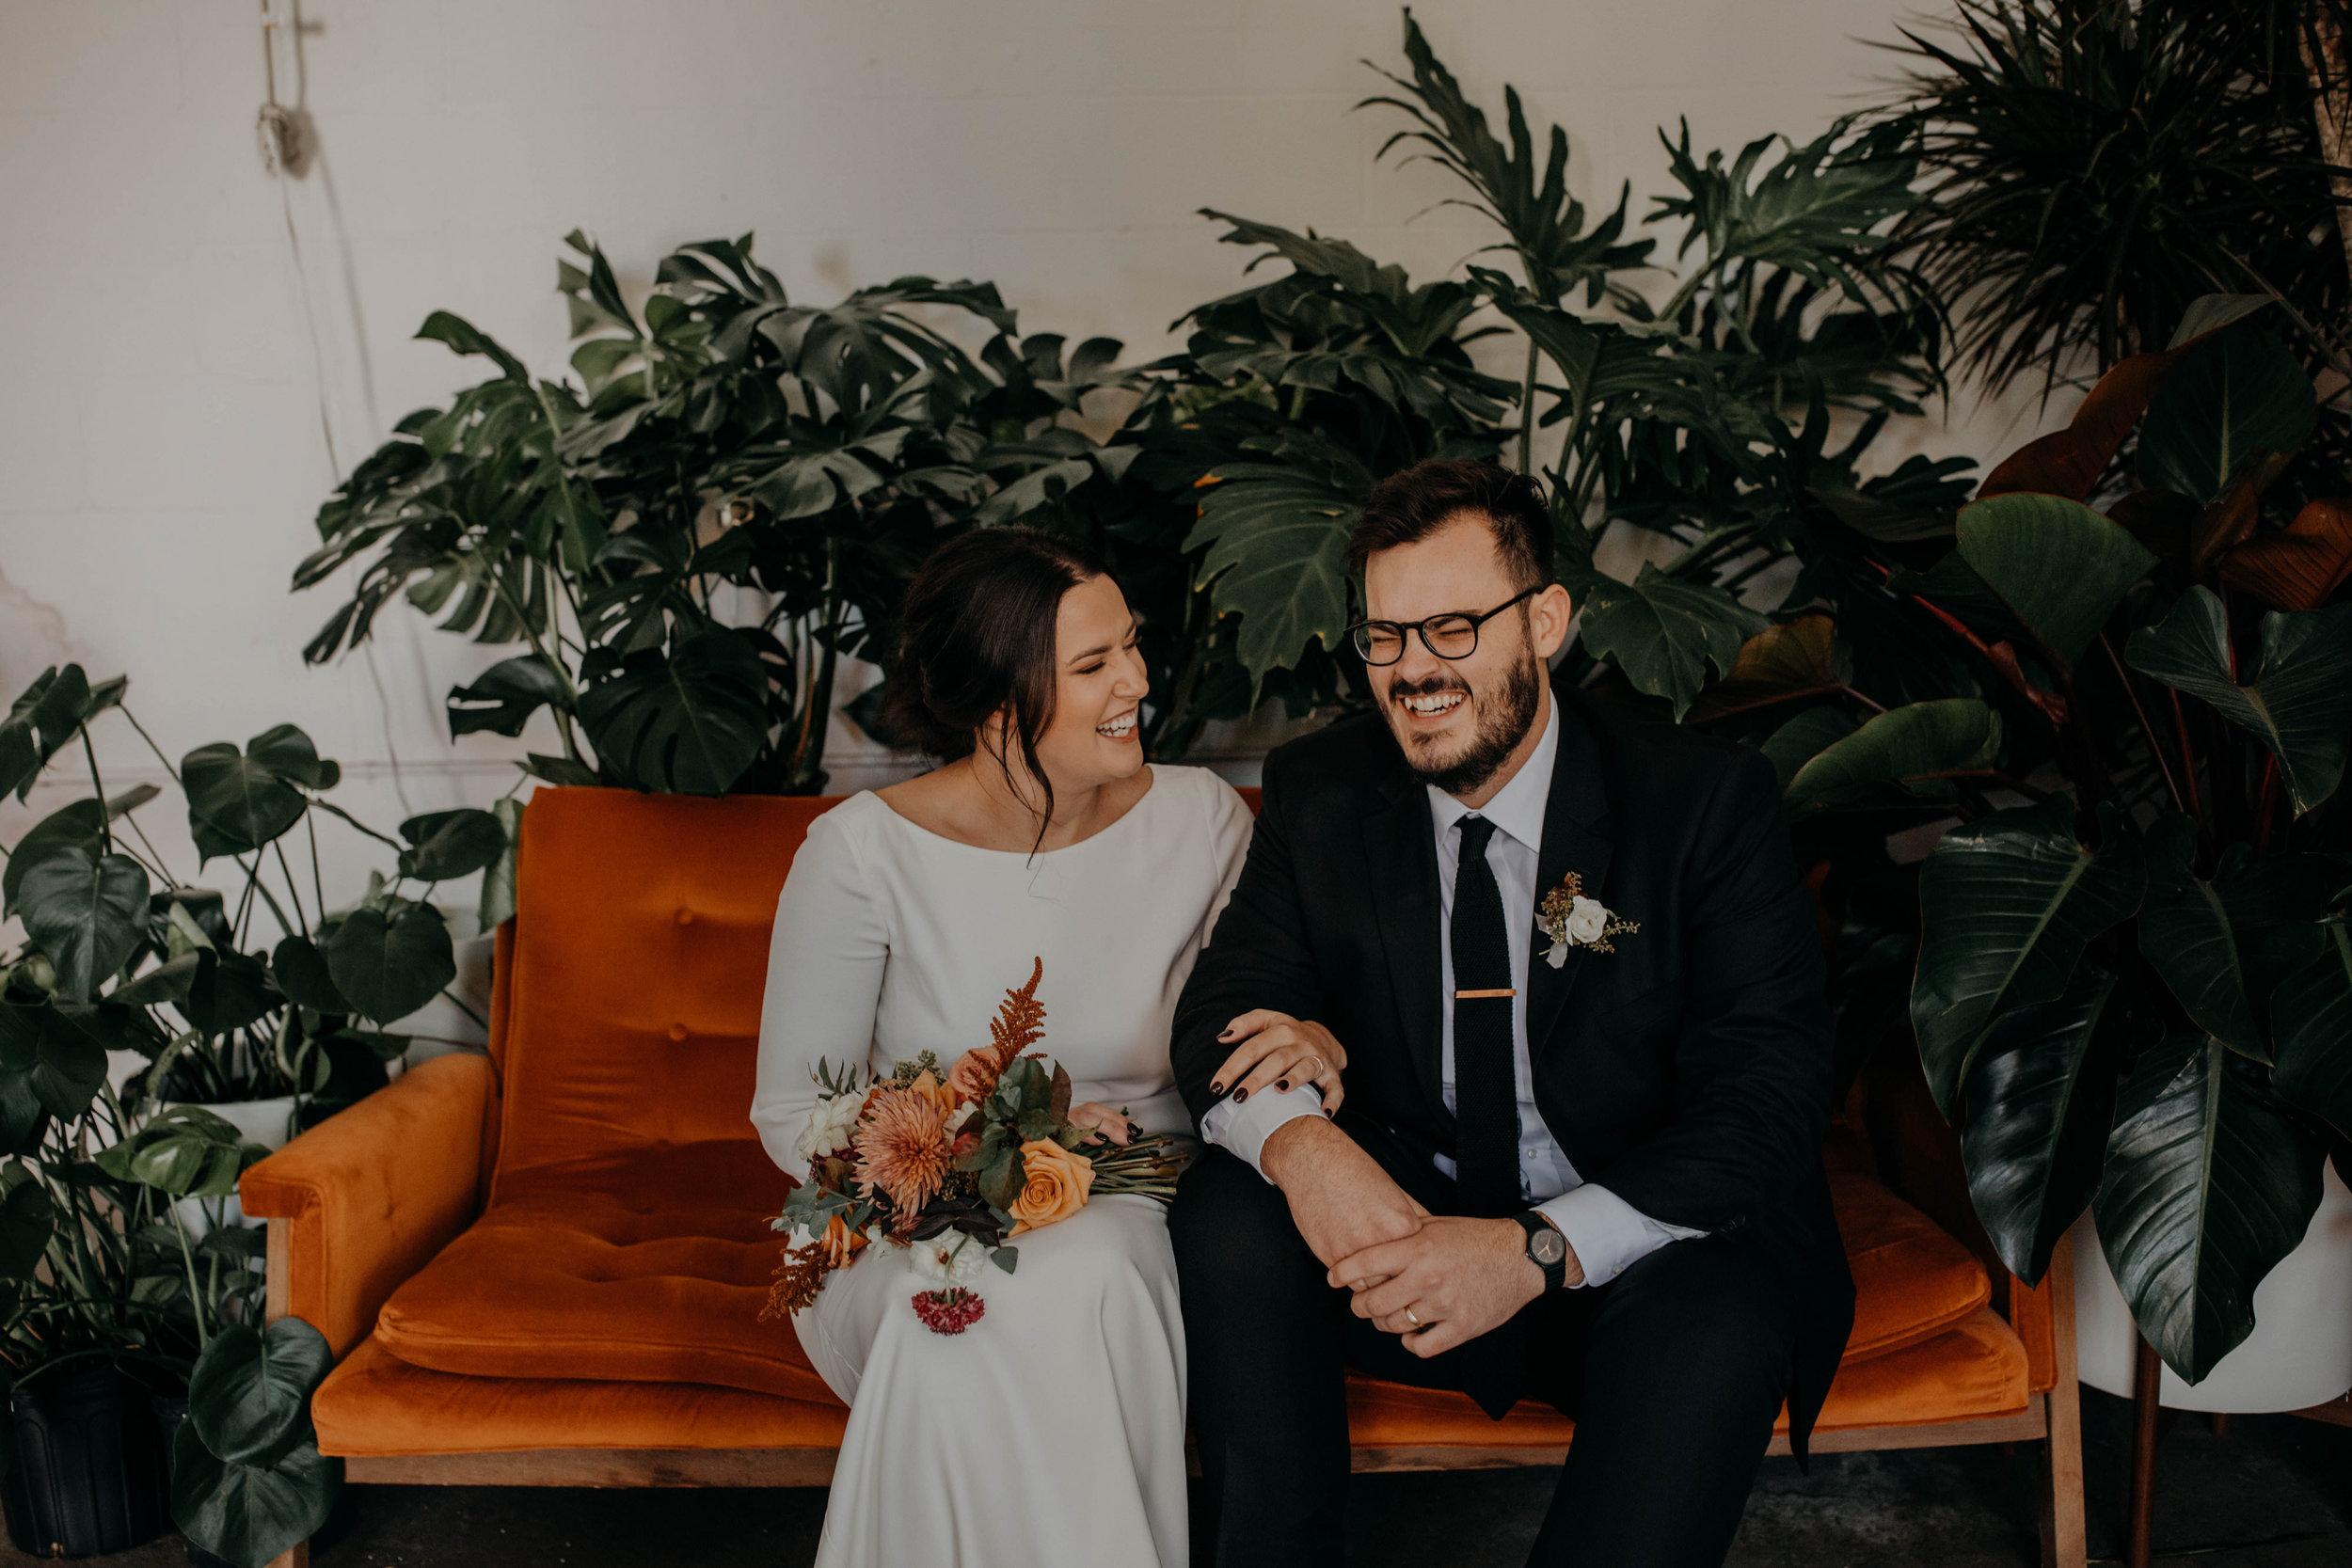 Fern shop Cincinnati intimate wedding ohio wedding photographer grace e jones photography232.jpg